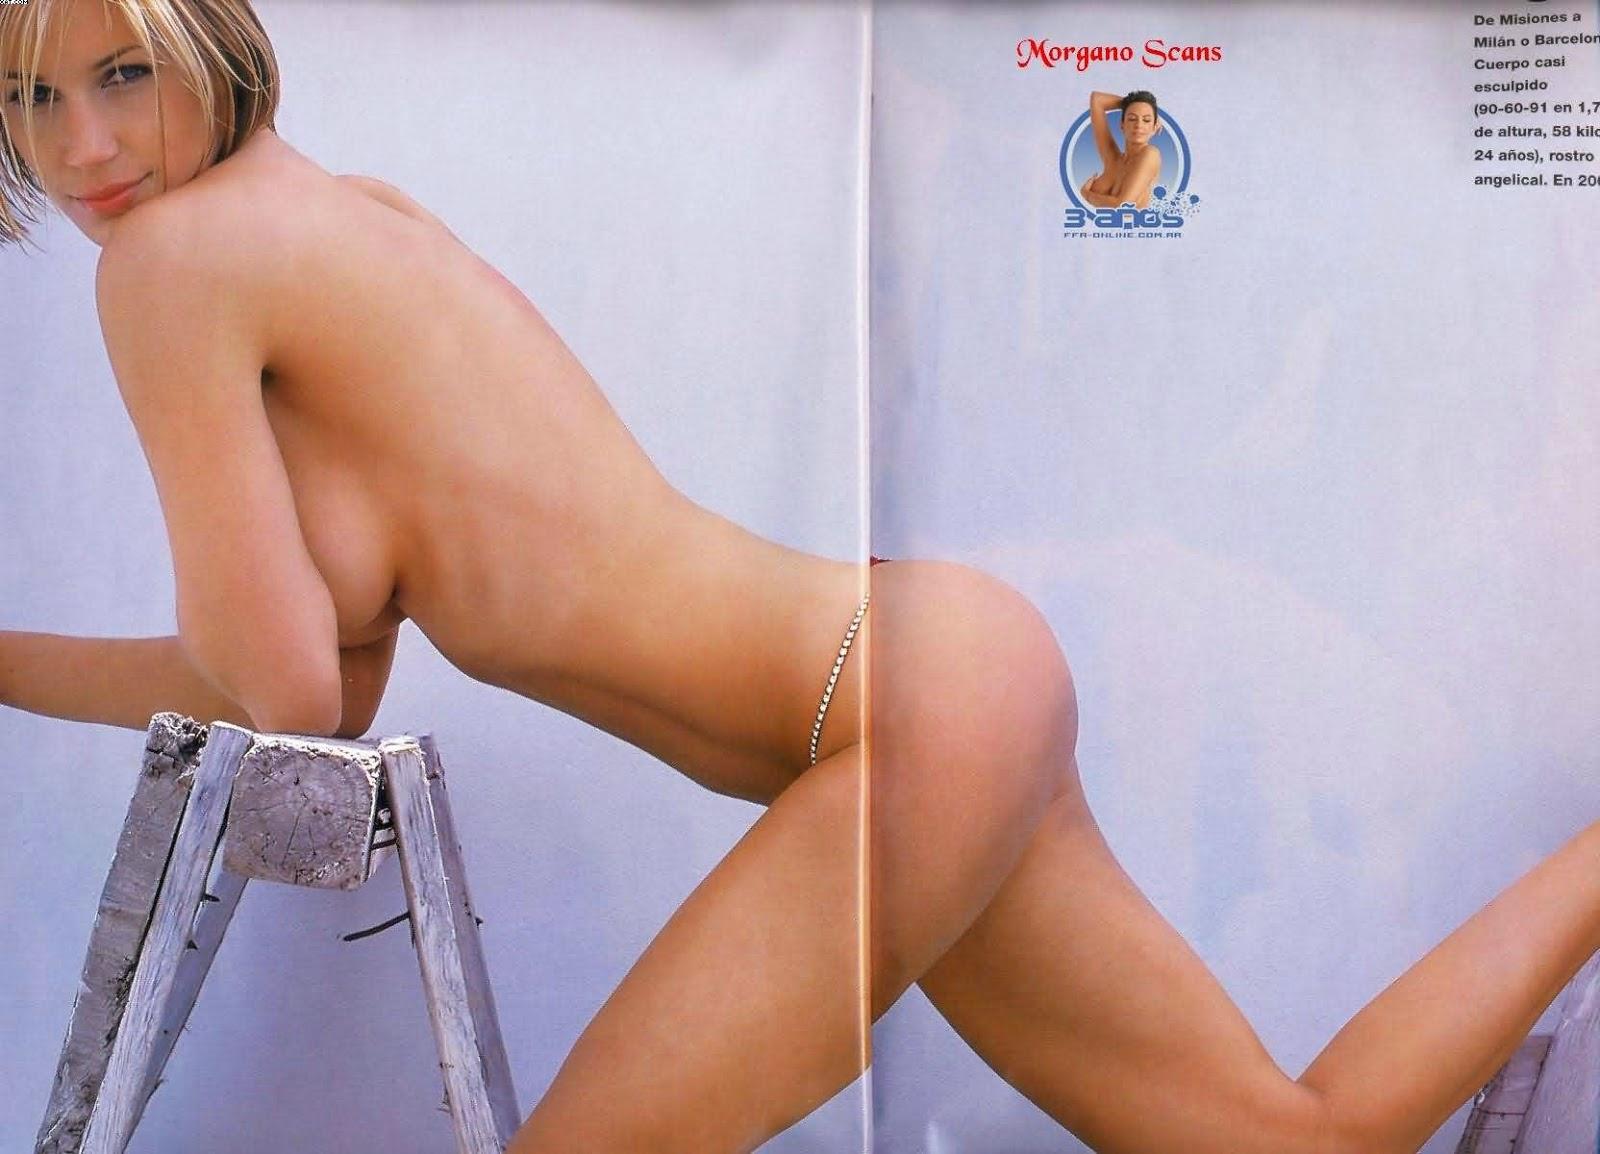 ingrid grudke desnuda: